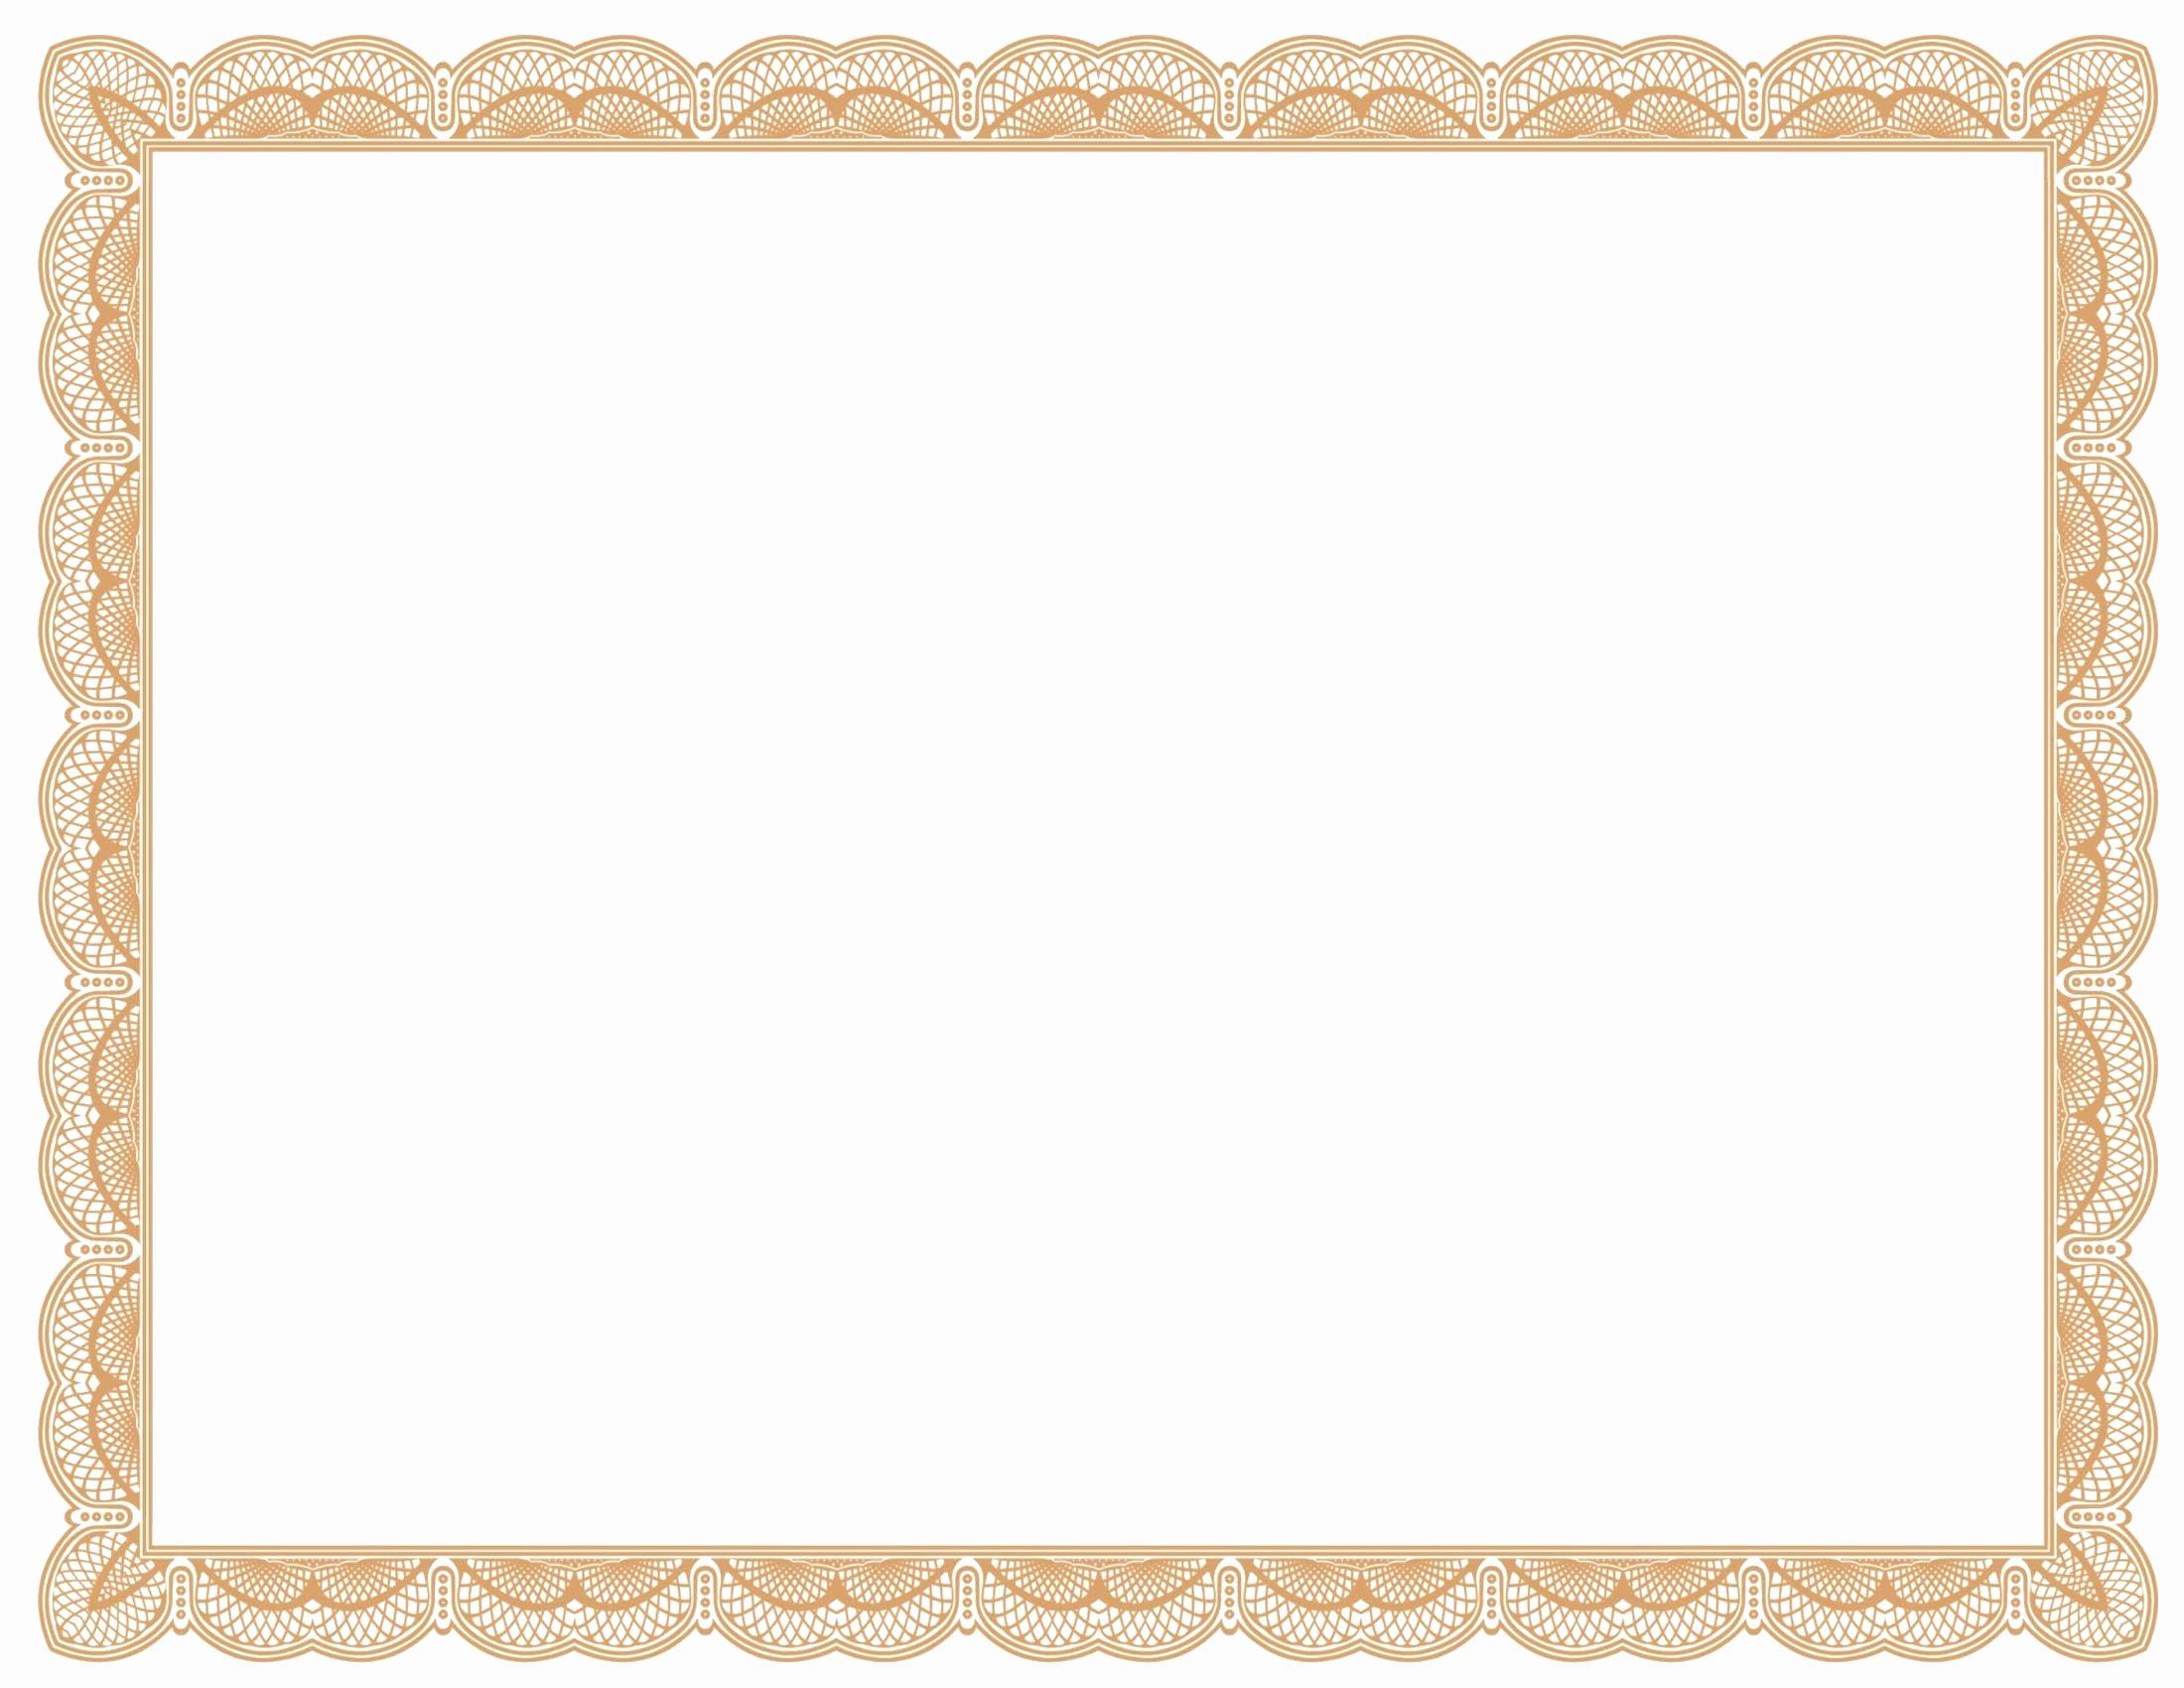 Free Vector Certificate Borders Best Of Certificate Border Vector Free Download at Getdrawings